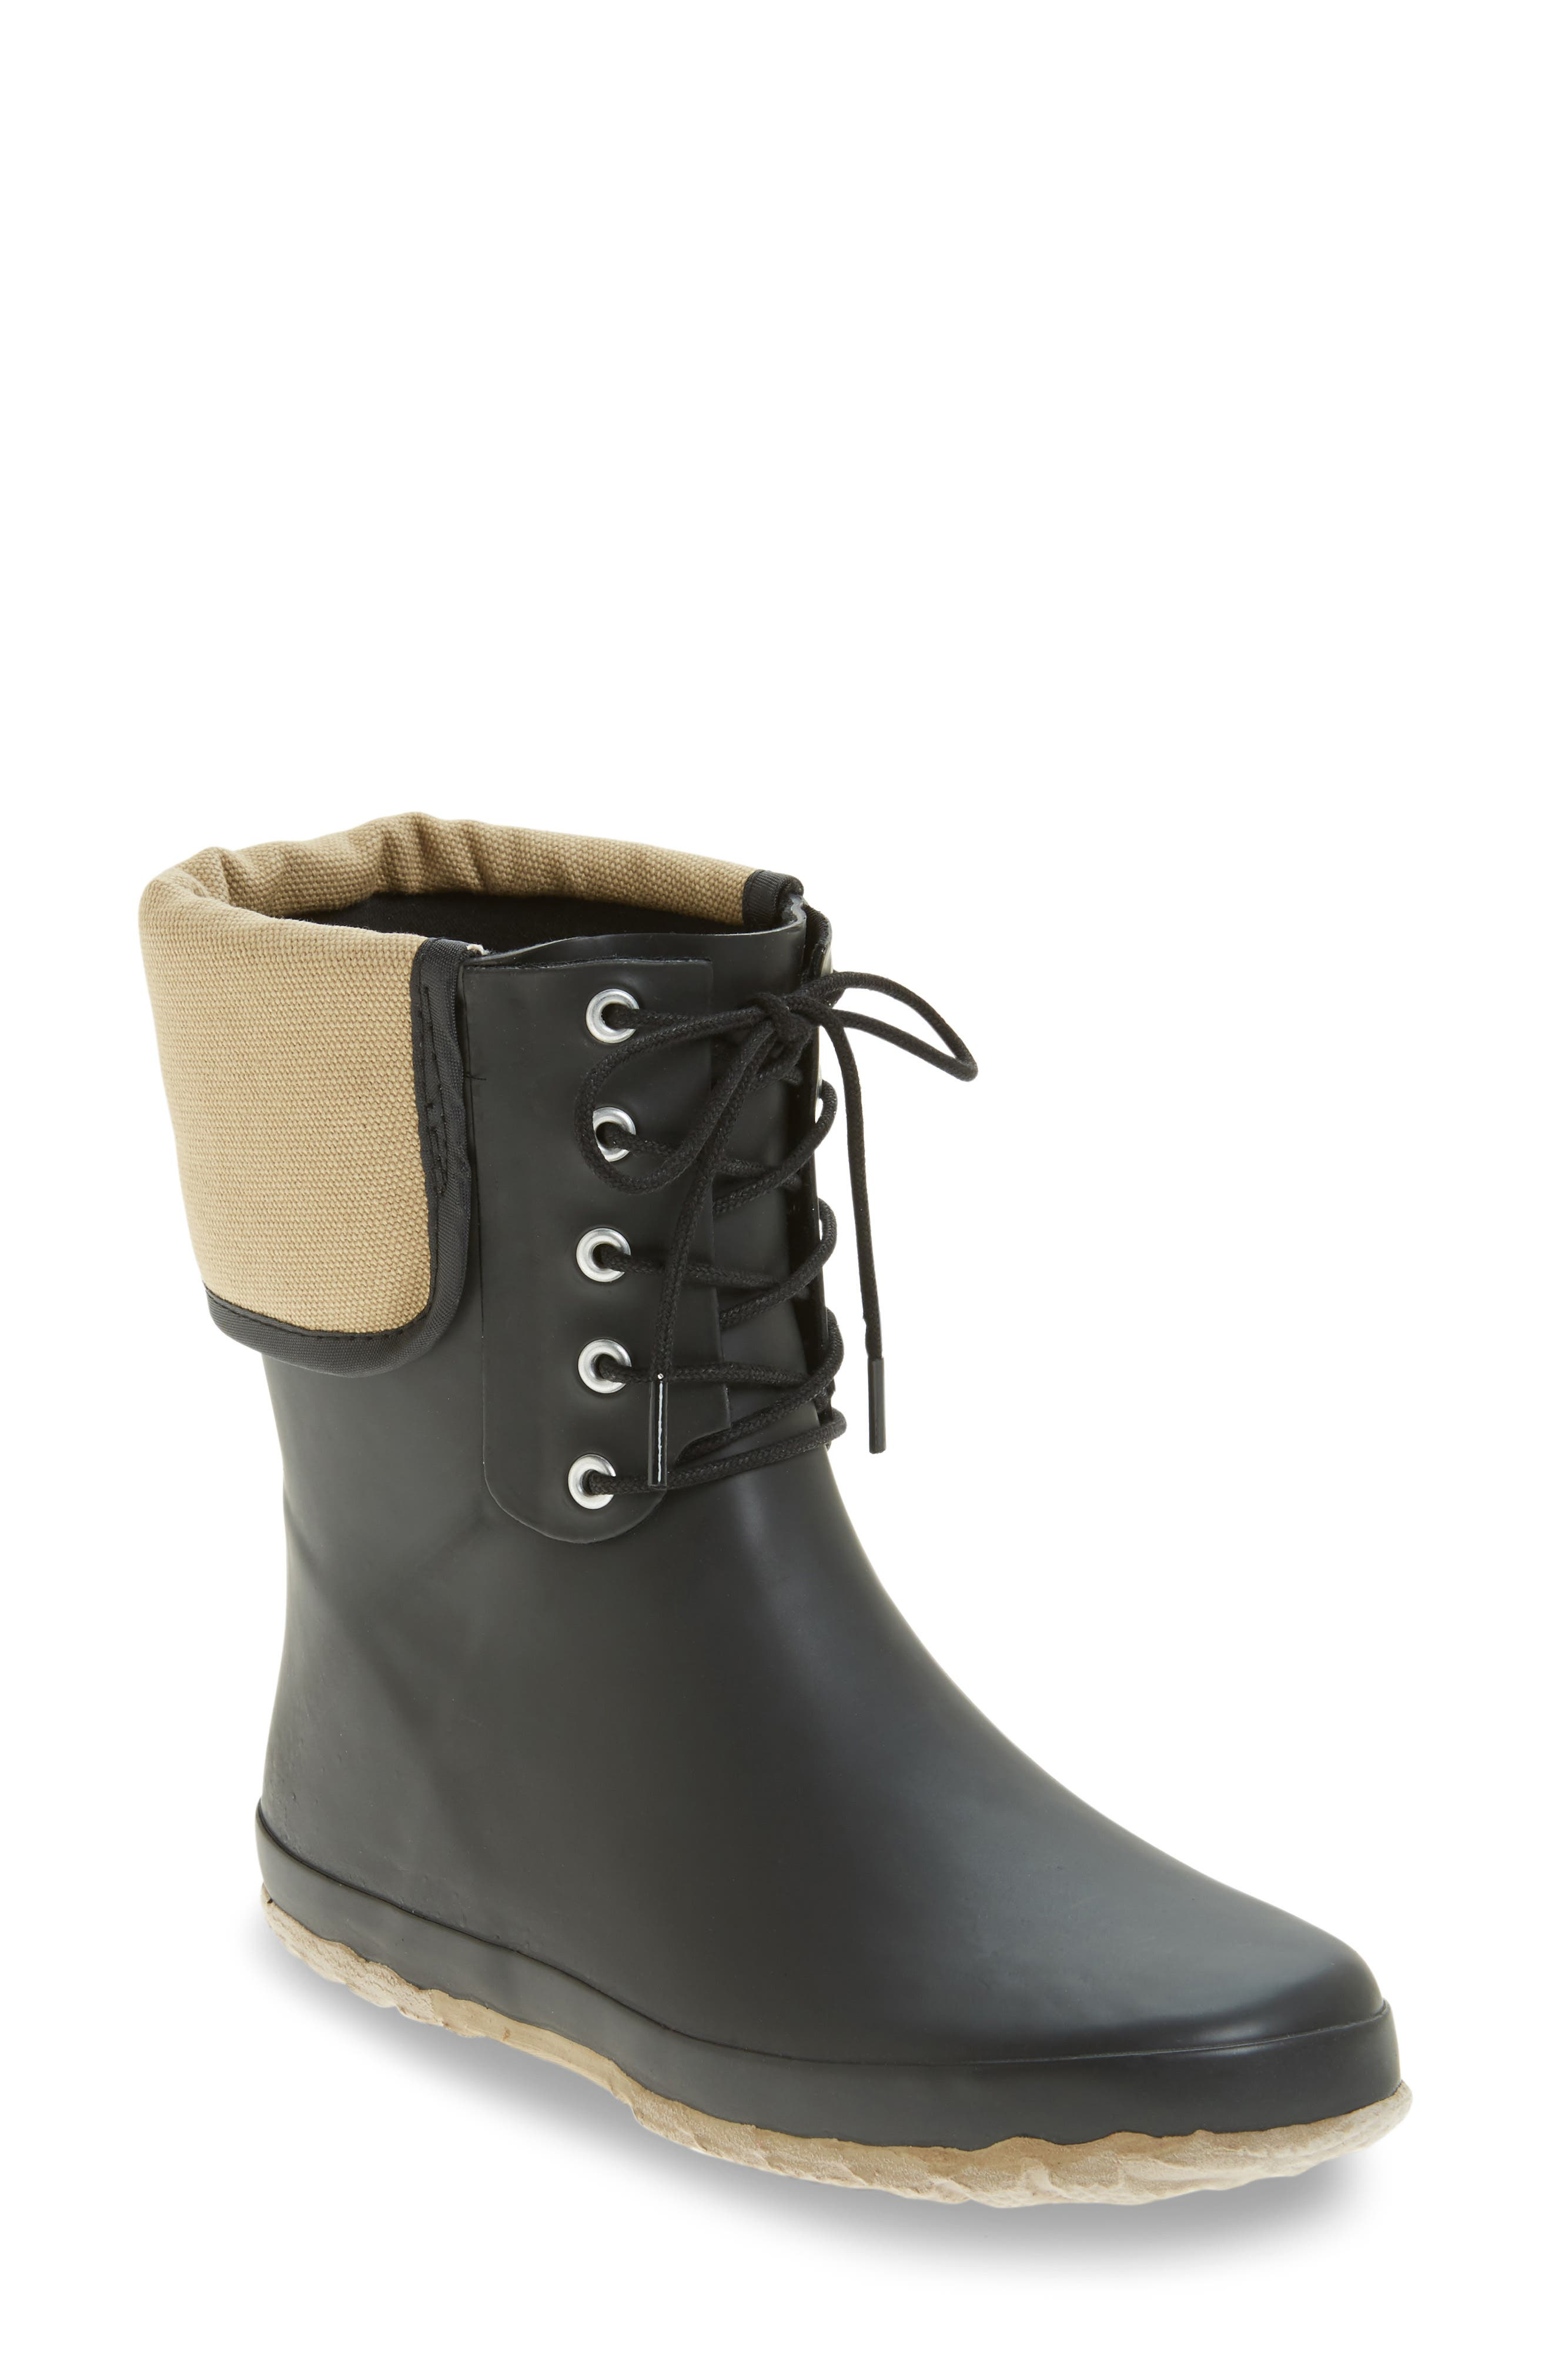 DÄV Lace-Up Mid Weatherproof Boot, Main, color, BLACK